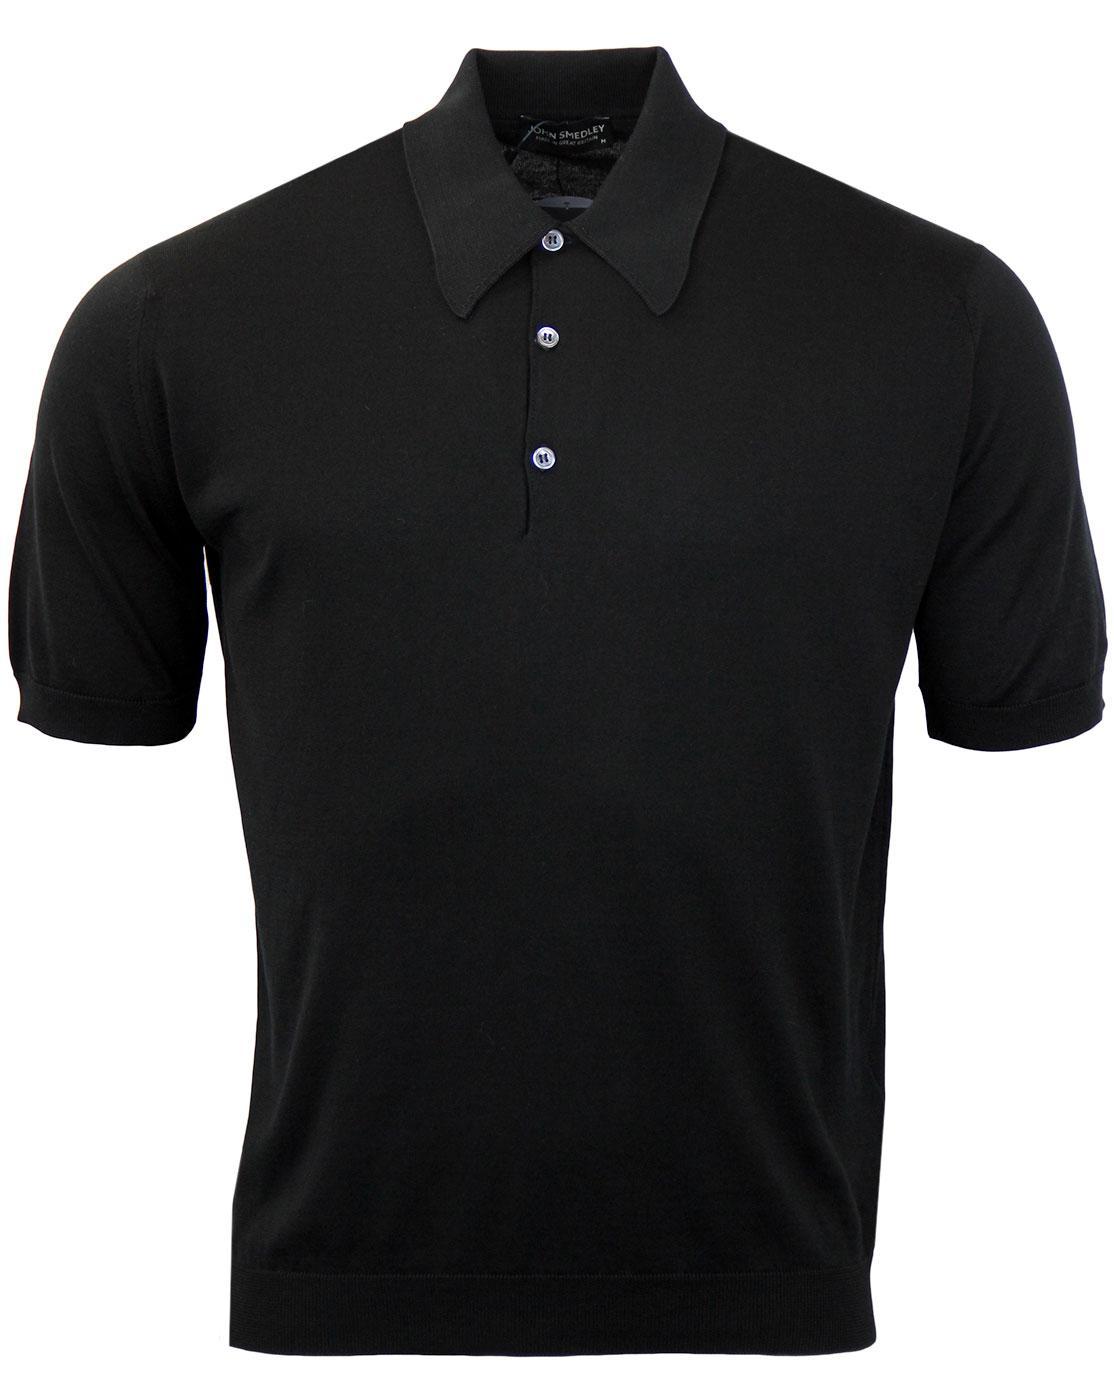 Isis JOHN SMEDLEY Classic Fit Retro Mod Polo Shirt